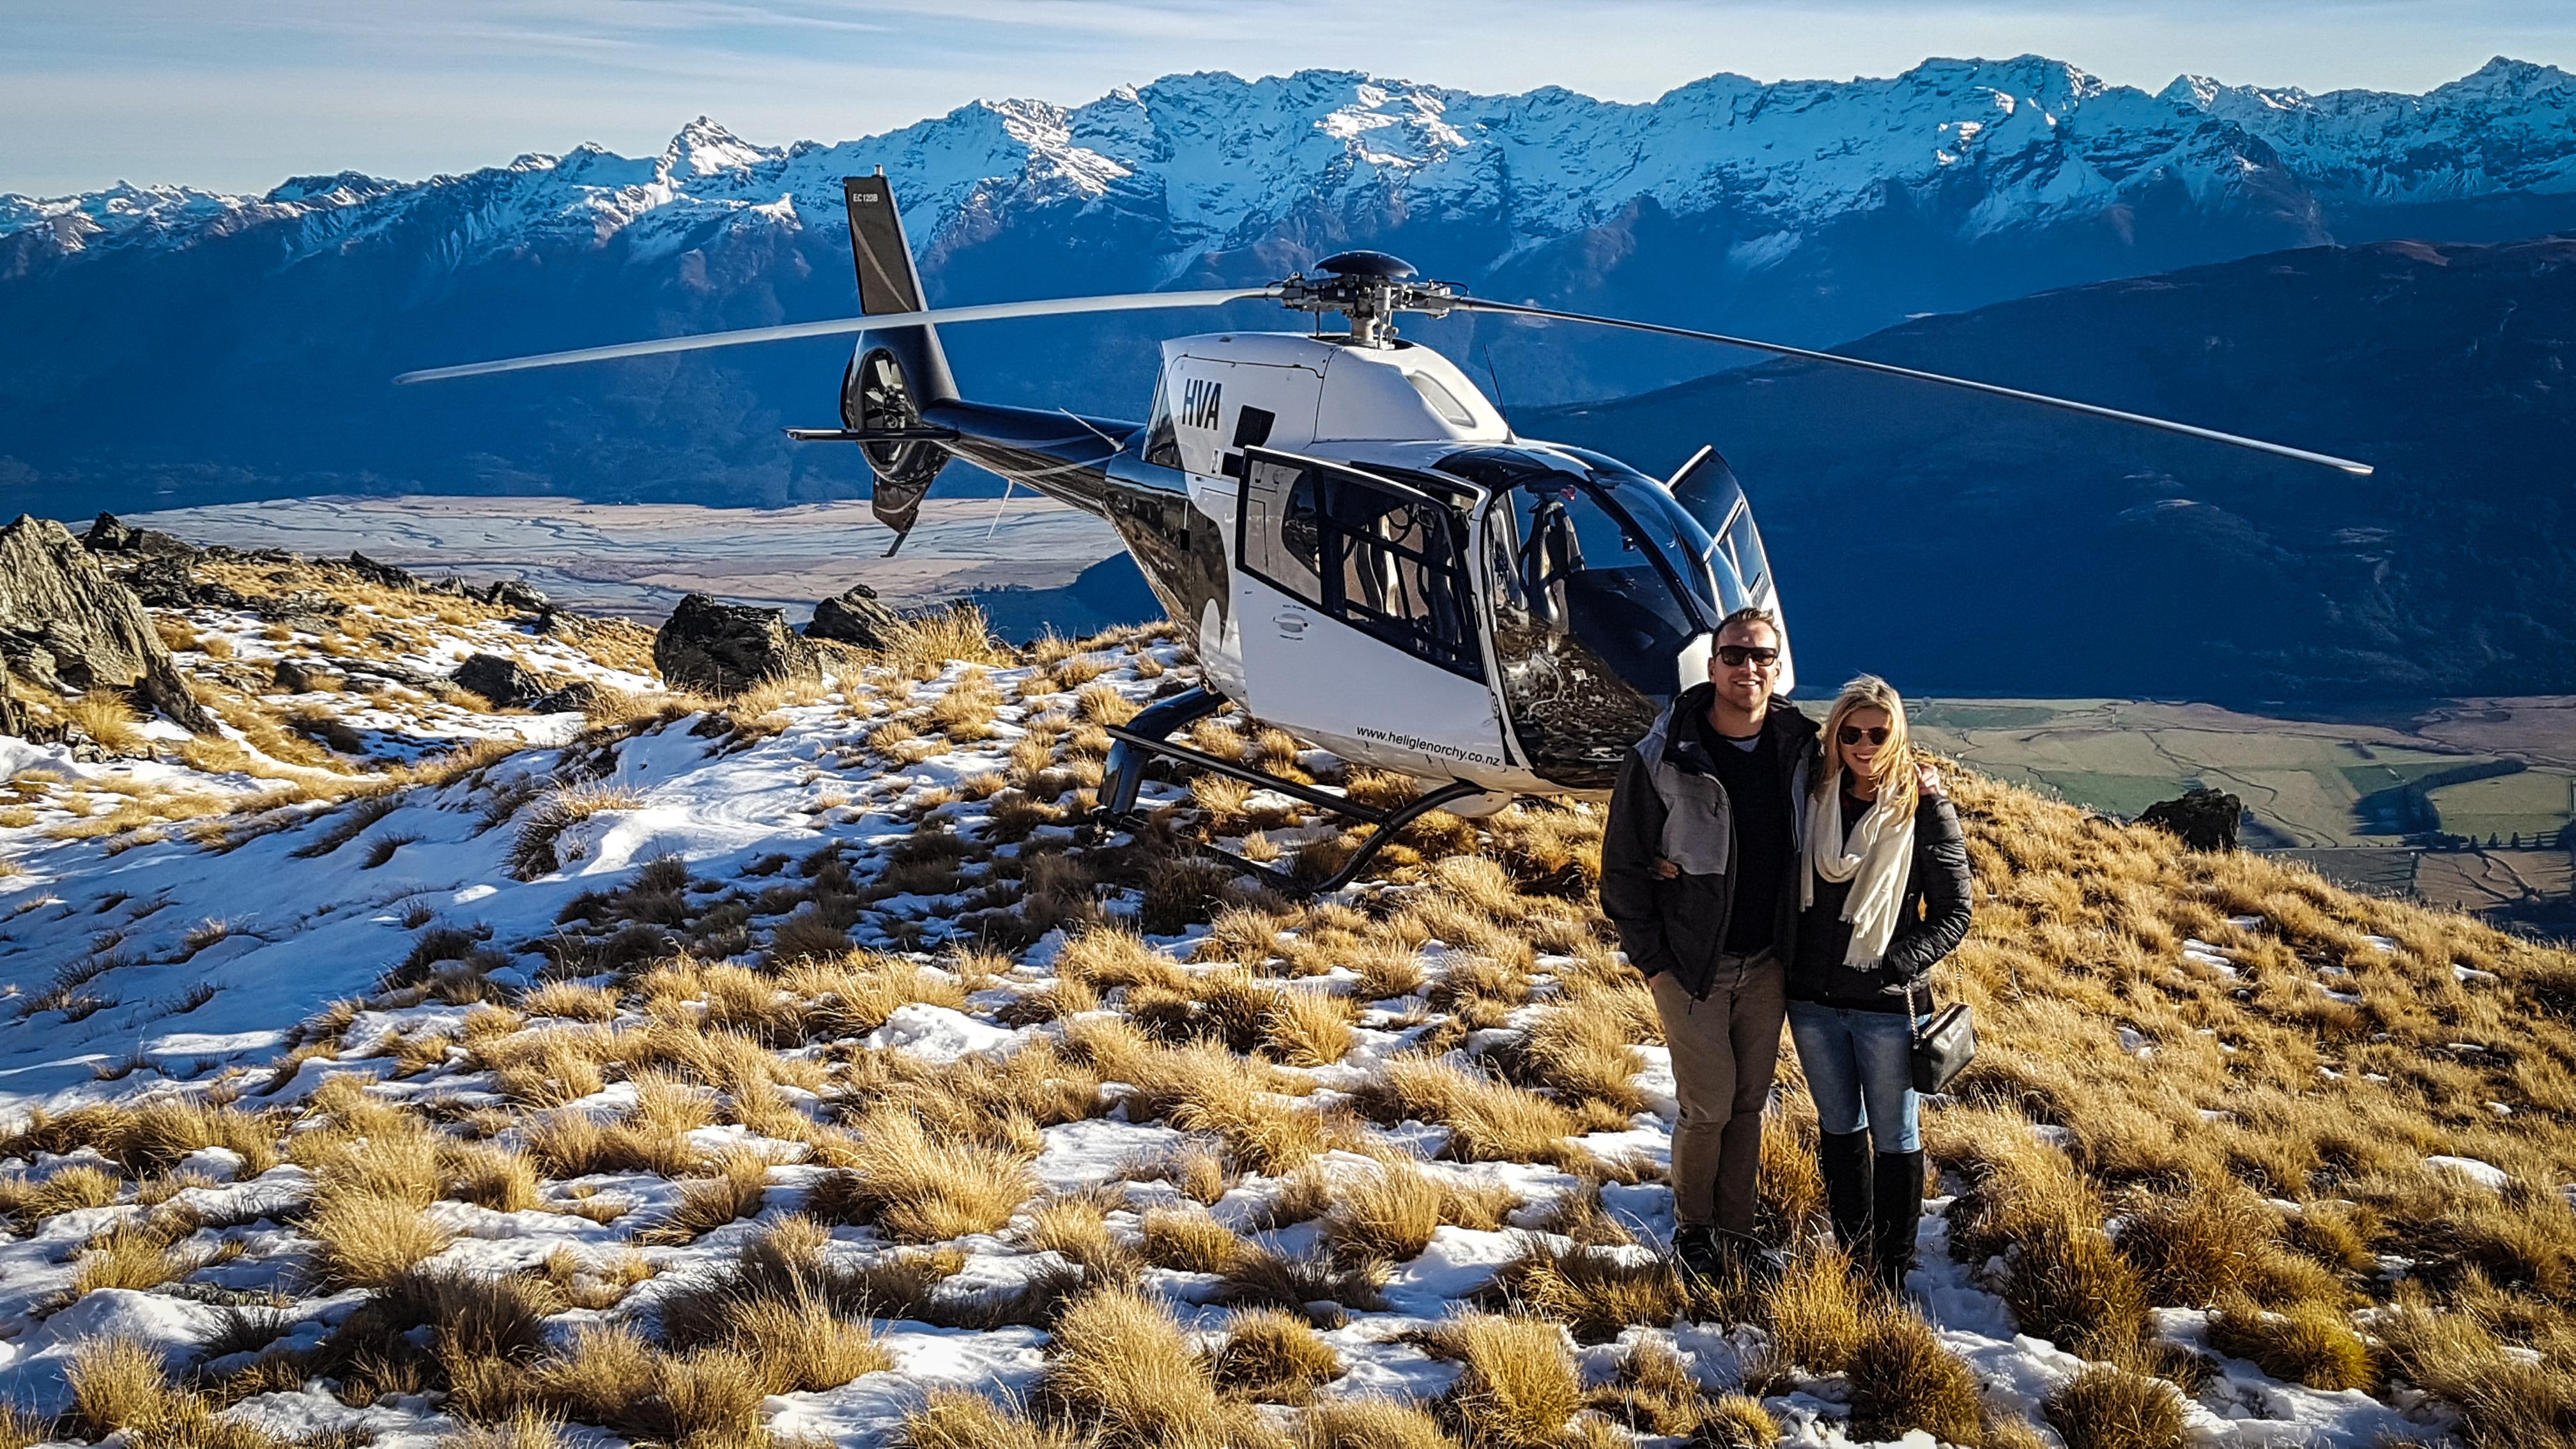 Heli Glenorchy Alpine Landing over Parad